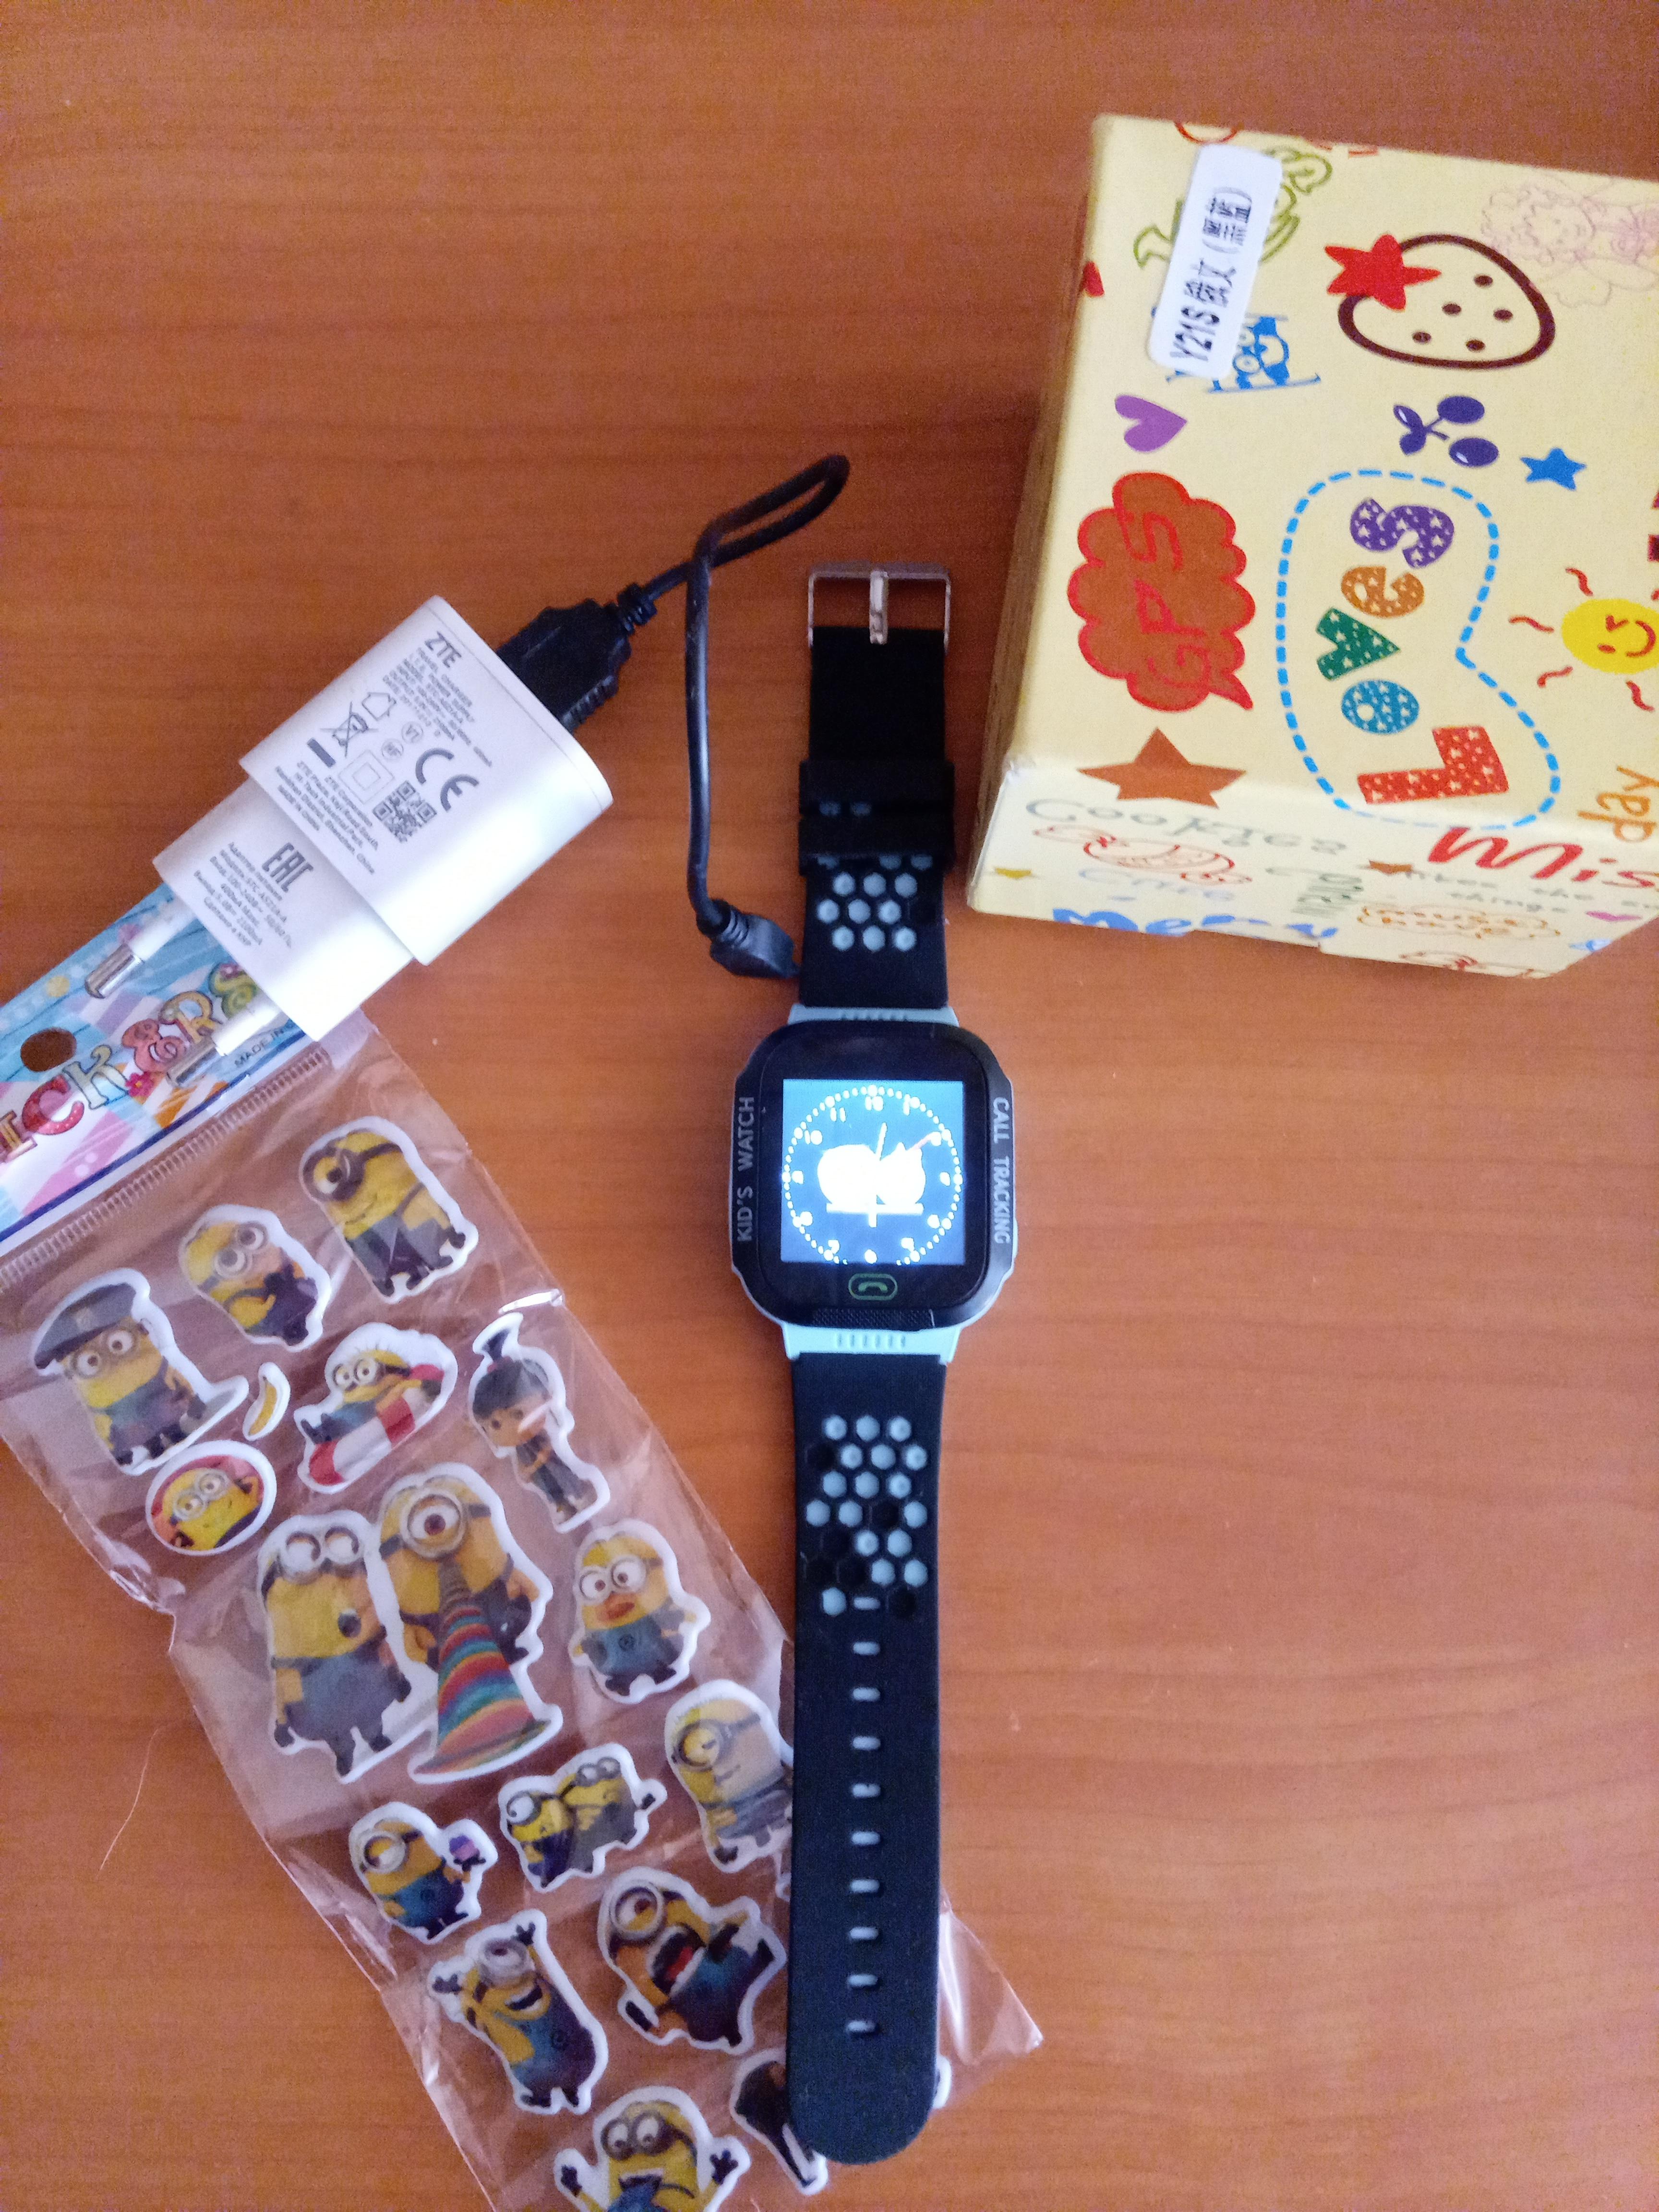 Greentiger Q15 Children Smart Watch Camera Flashlight SOS Call  LBS Tracking Location Waterproof Remote MonitorKids Smartwatch|Smart Watches|   - AliExpress